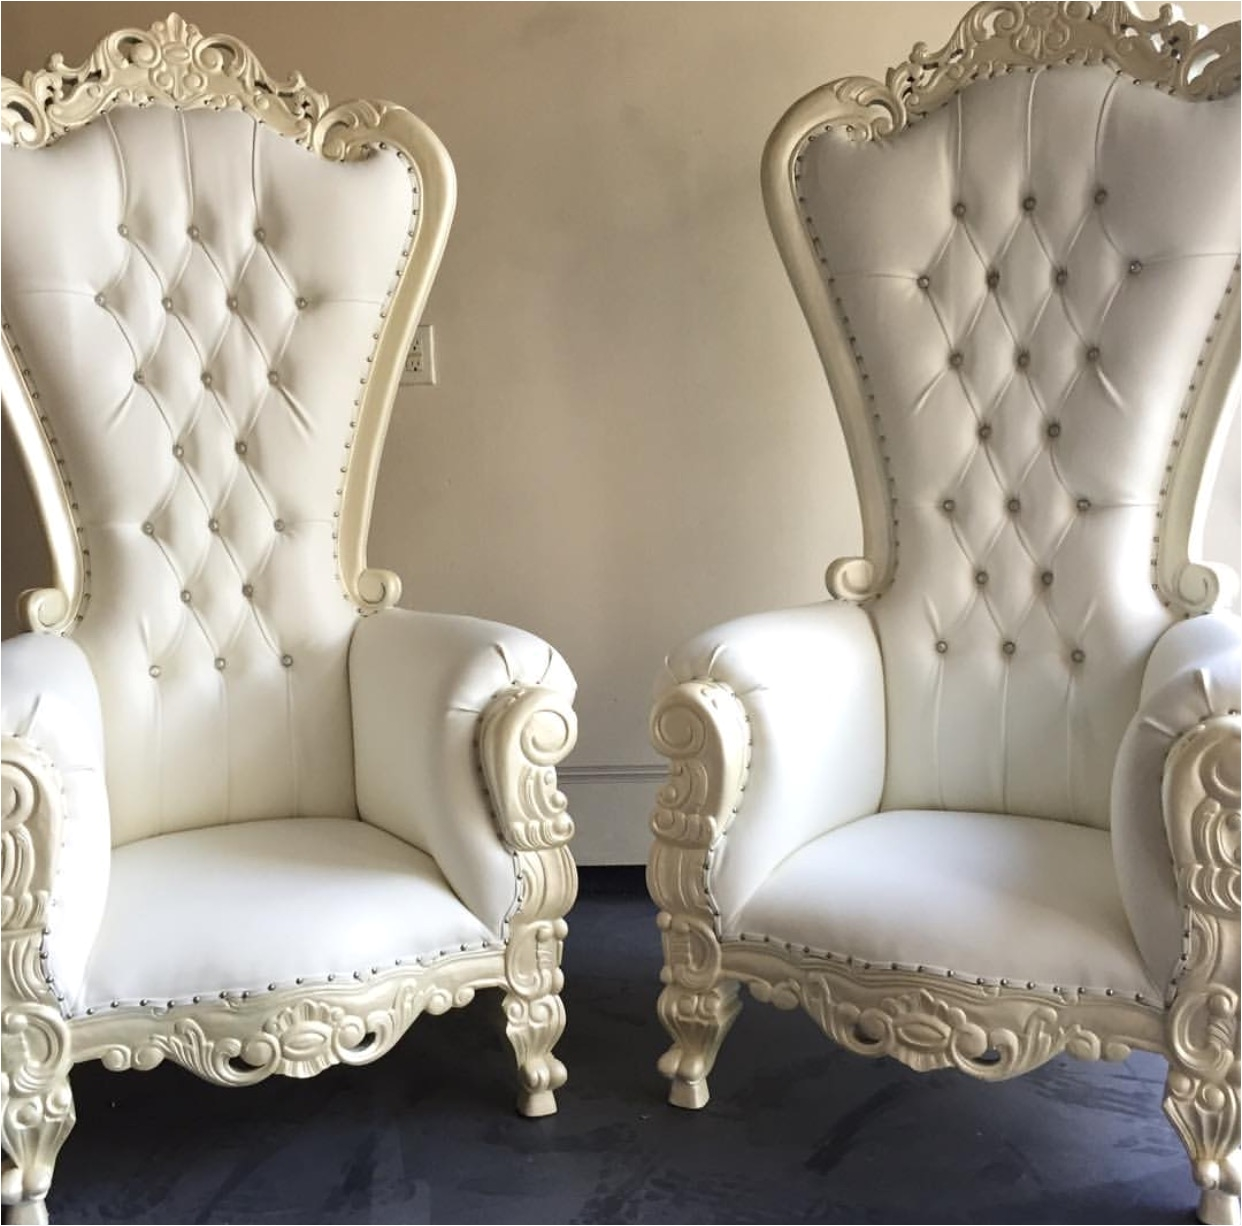 Baby Shower Throne Chair Rental Nj Baby Shower Chair Rental Brooklyn Images Handicraft Ideas Home